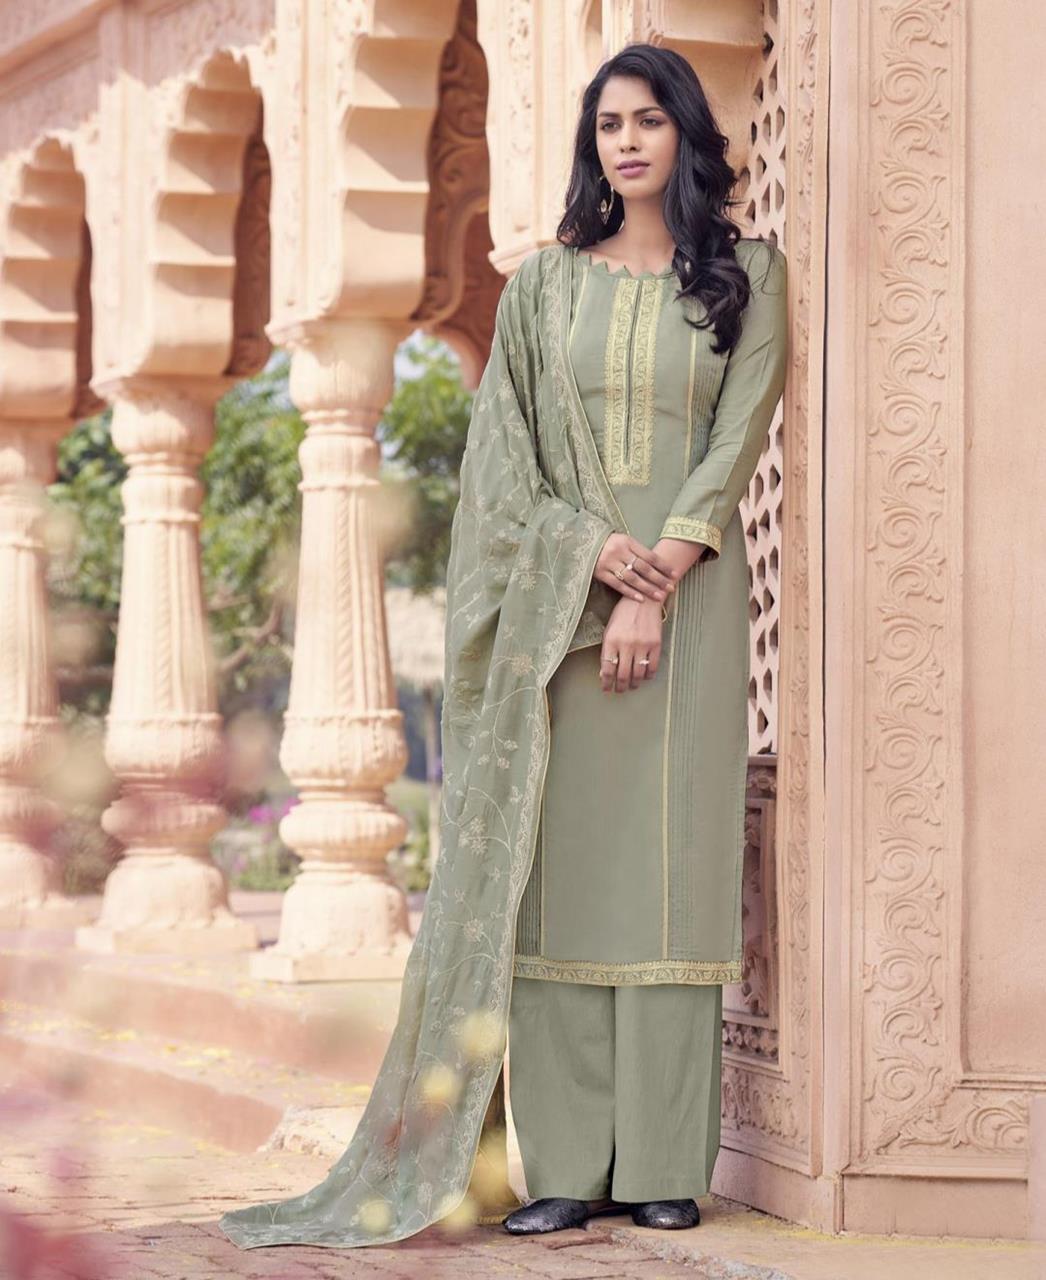 Zari Cotton Straight cut Salwar Kameez in Grey